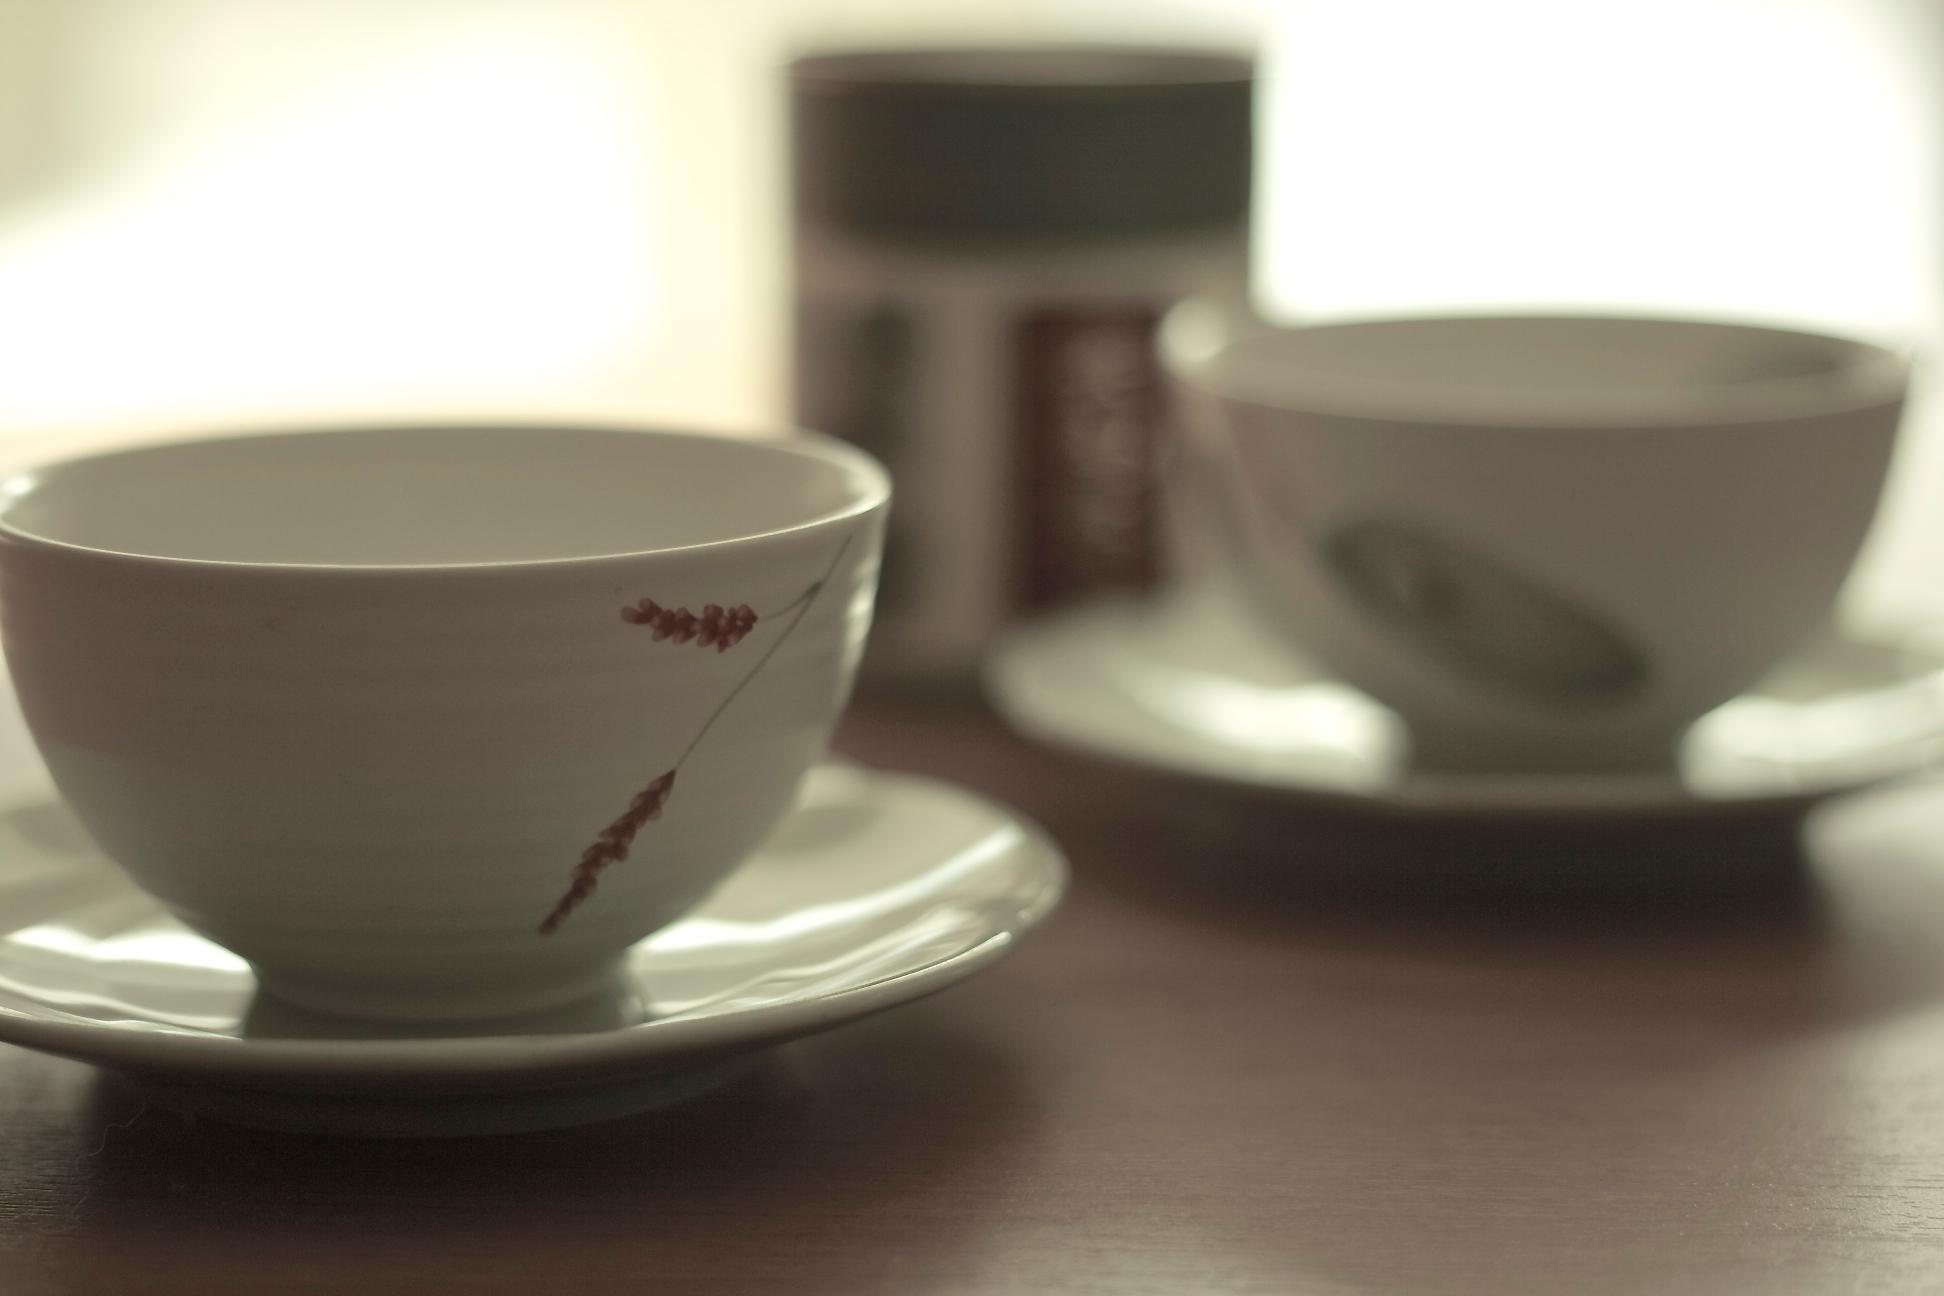 Tassen Design wallpaper china interior tea caffeine mug drinkware